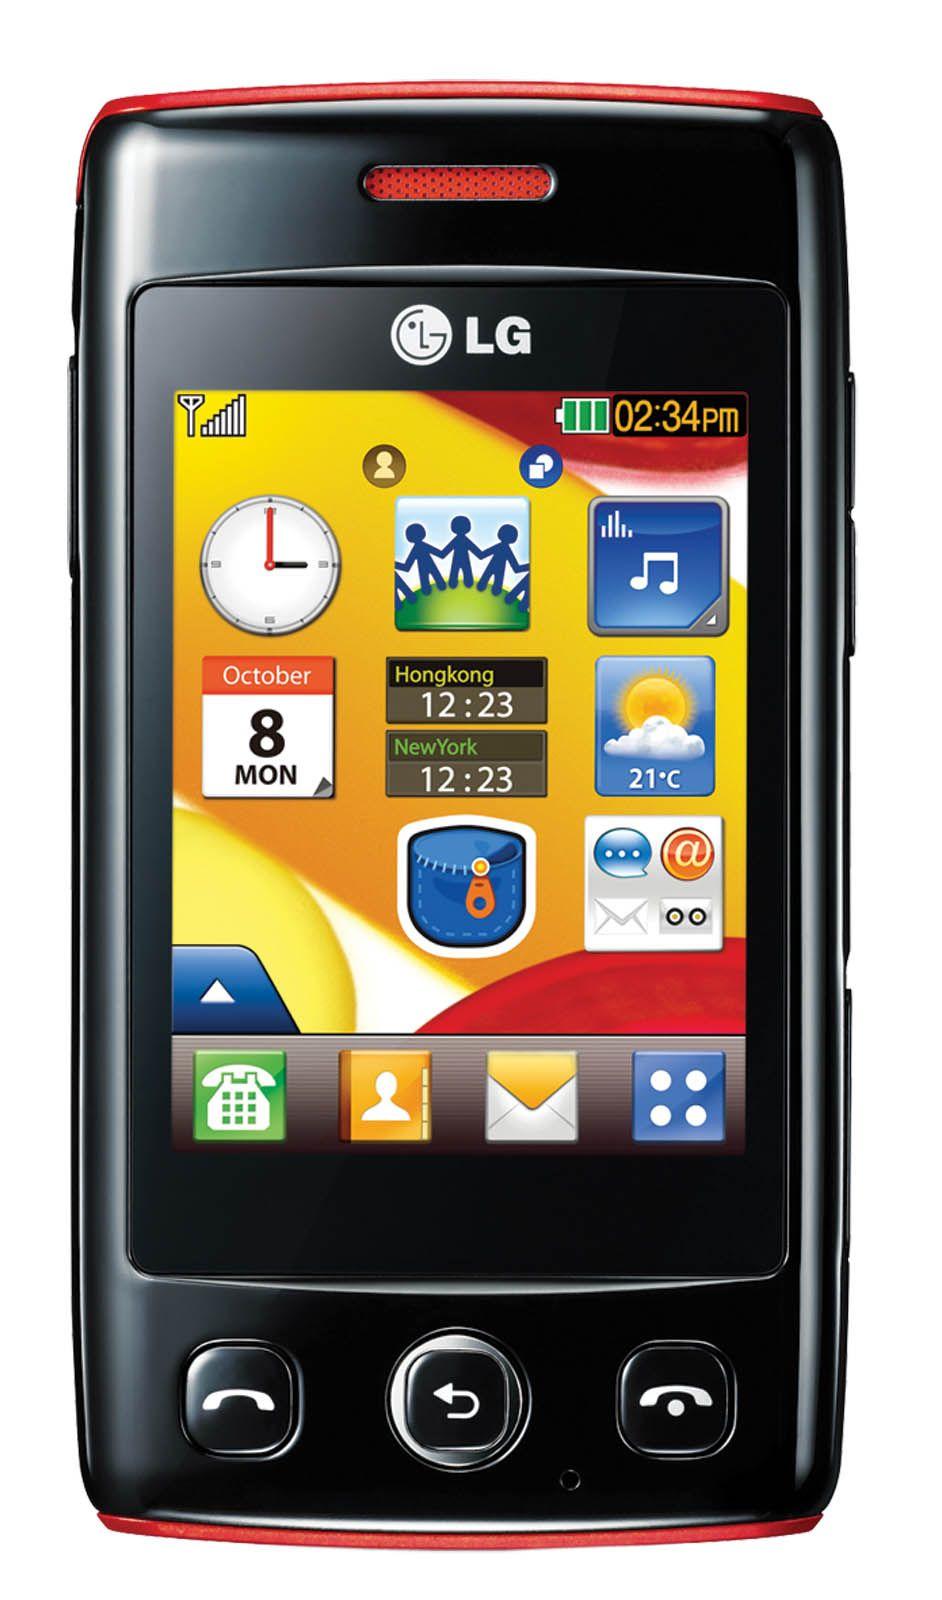 LG T300 1,089.00 www.dait.mx Telefonia, Thing 1, Equipo